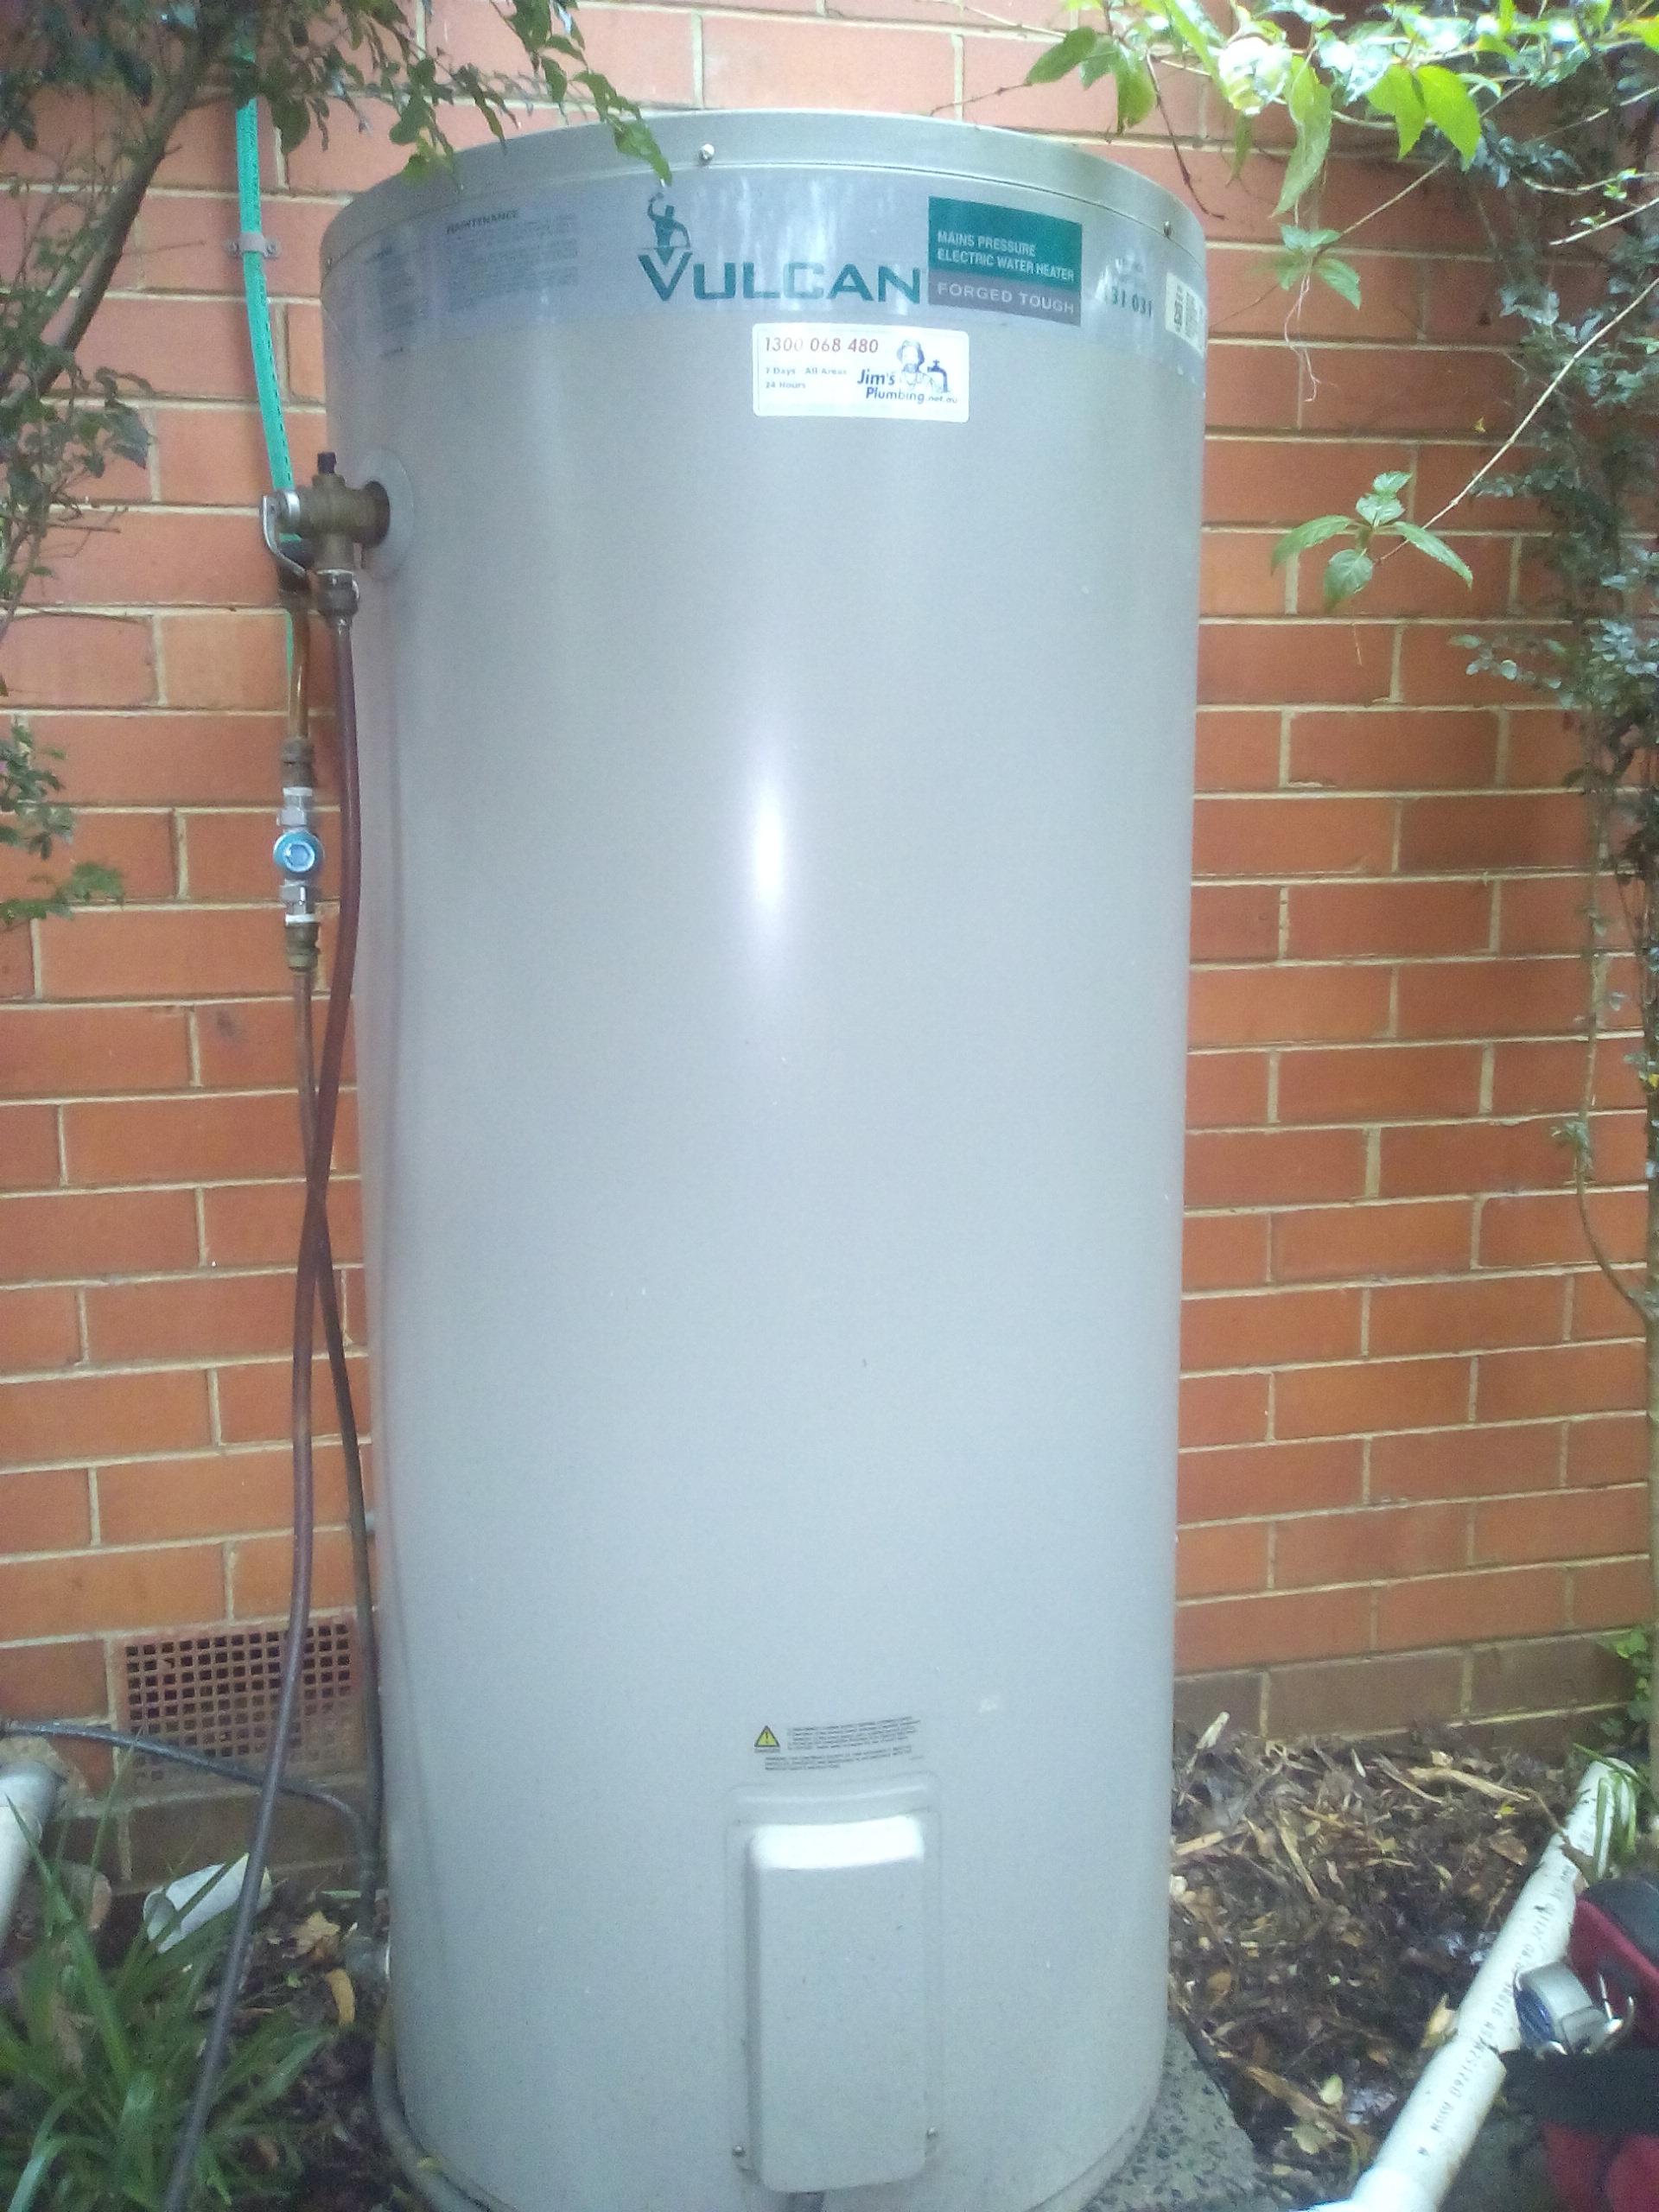 Vulcan 250L Electric Storage Hot Water Tank Electrical Meter Board ...